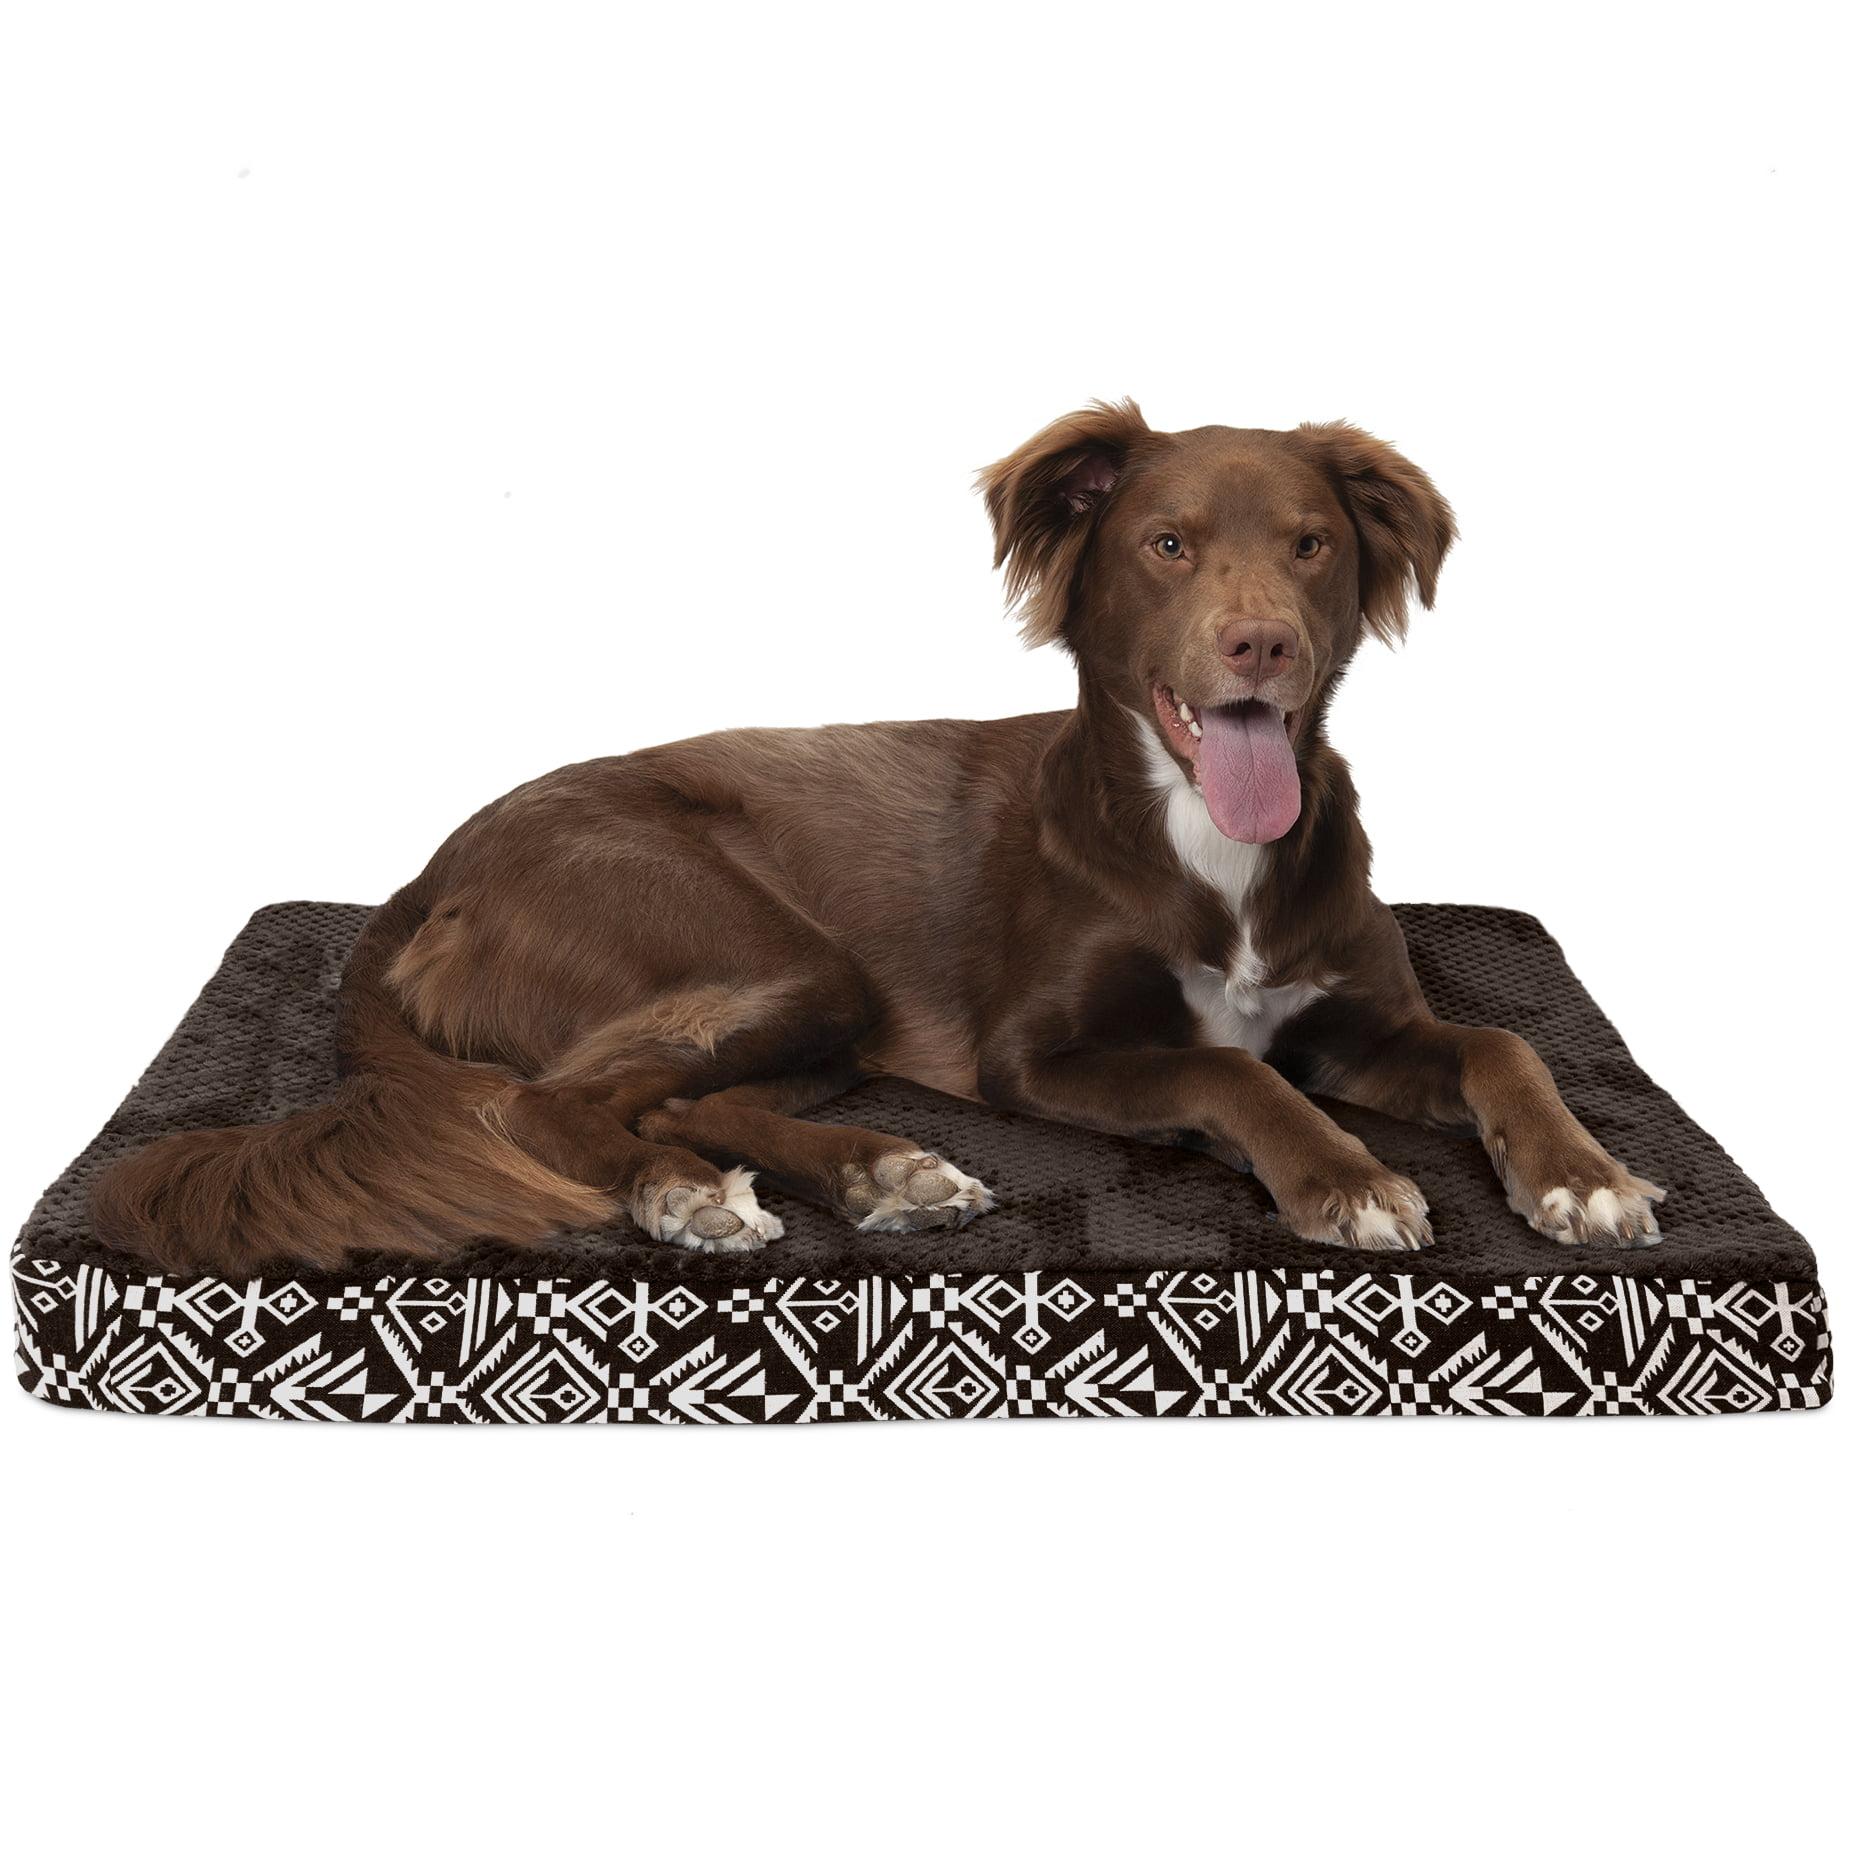 FurHaven Pet Dog Bed | Deluxe Cooling Gel Memory Foam Orthopedic Plush Kilim Mattress Pet Bed for Dogs & Cats, Southwest Espresso, Large